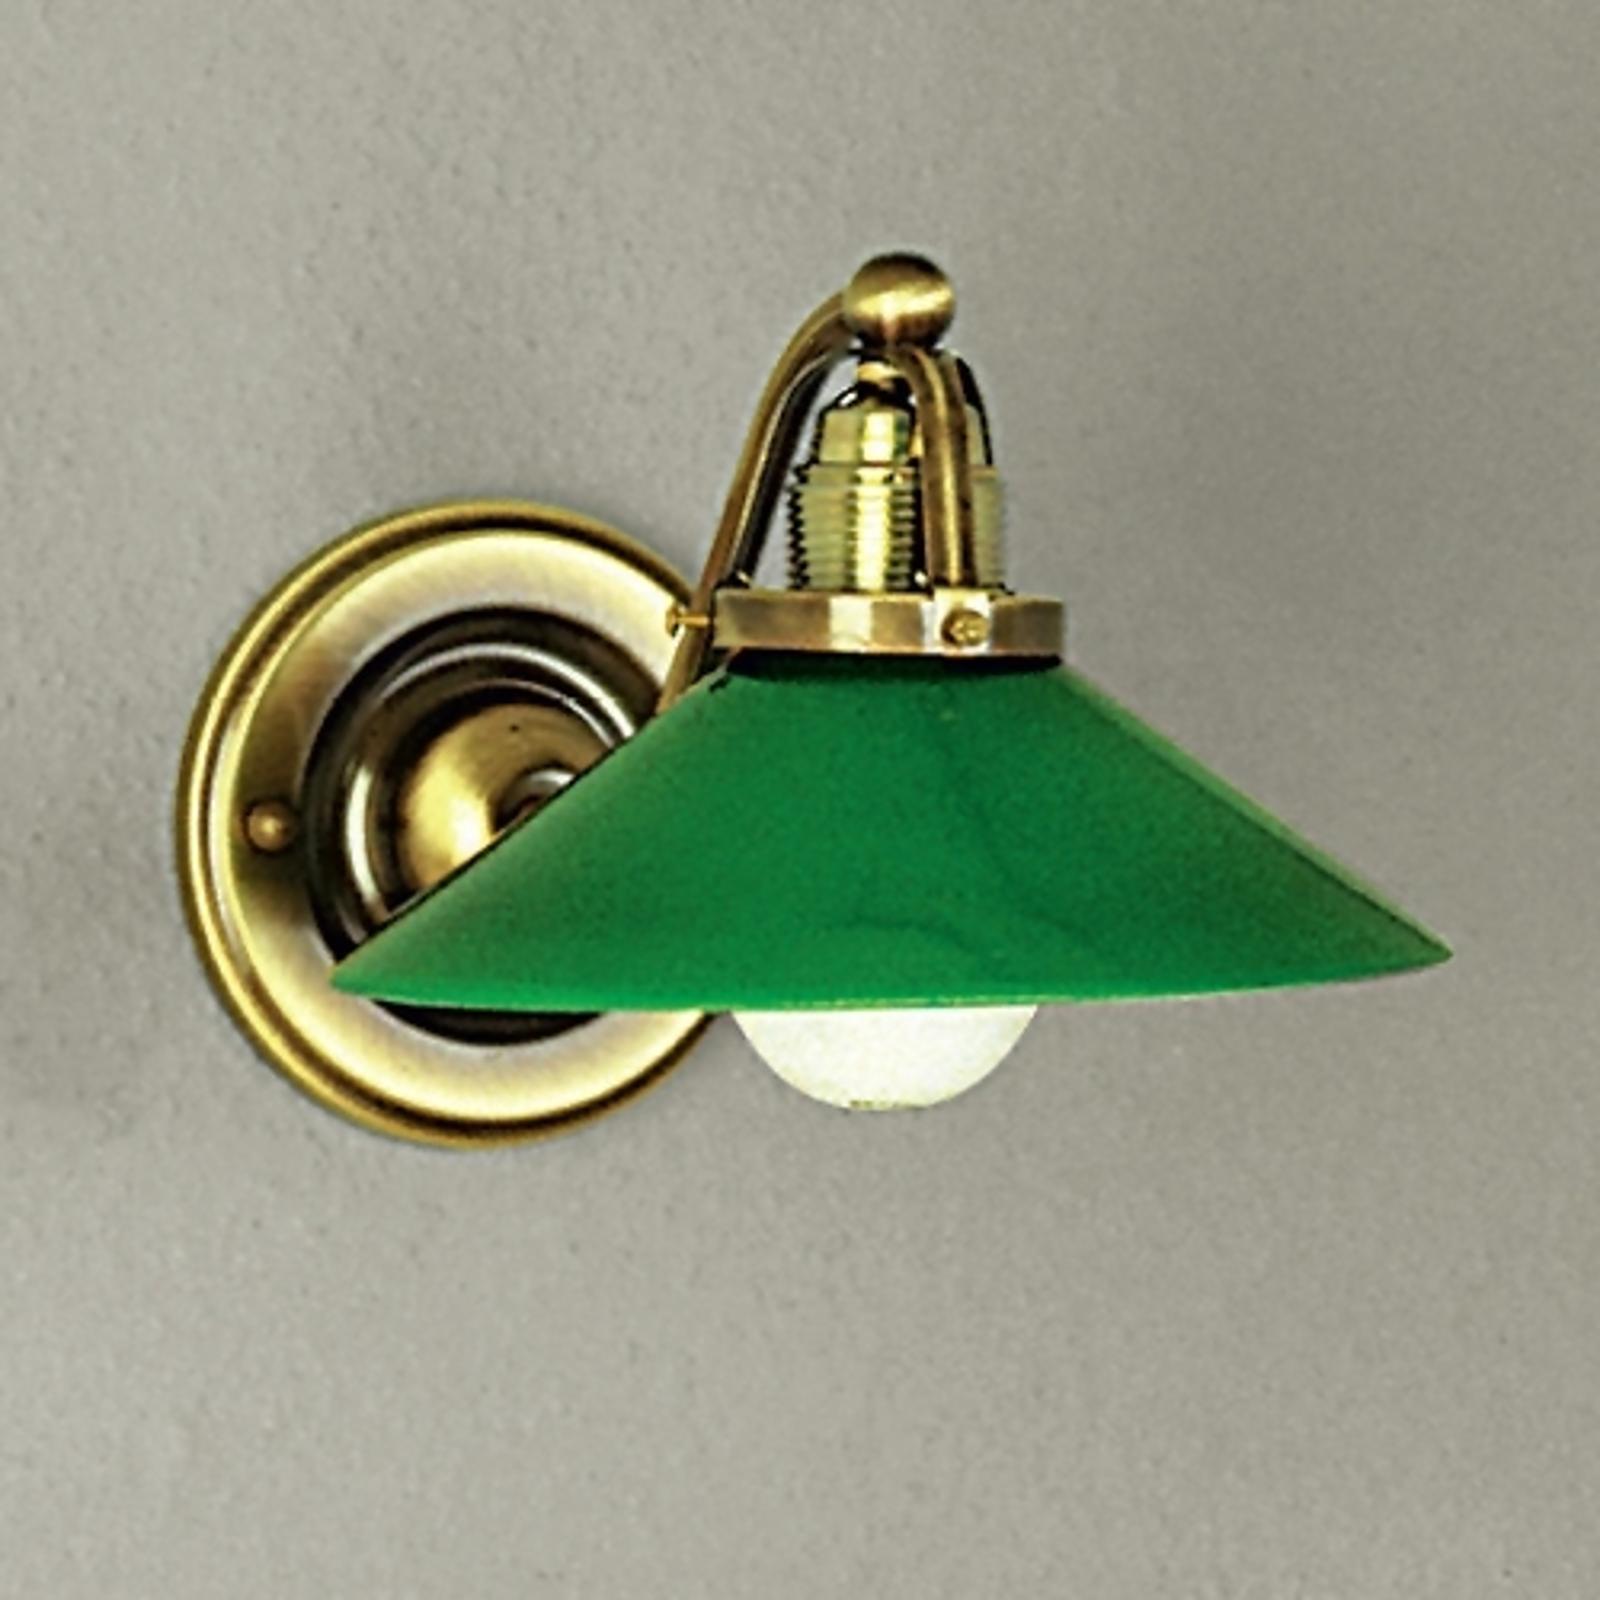 Groene wandlamp VERDINA, patina-look